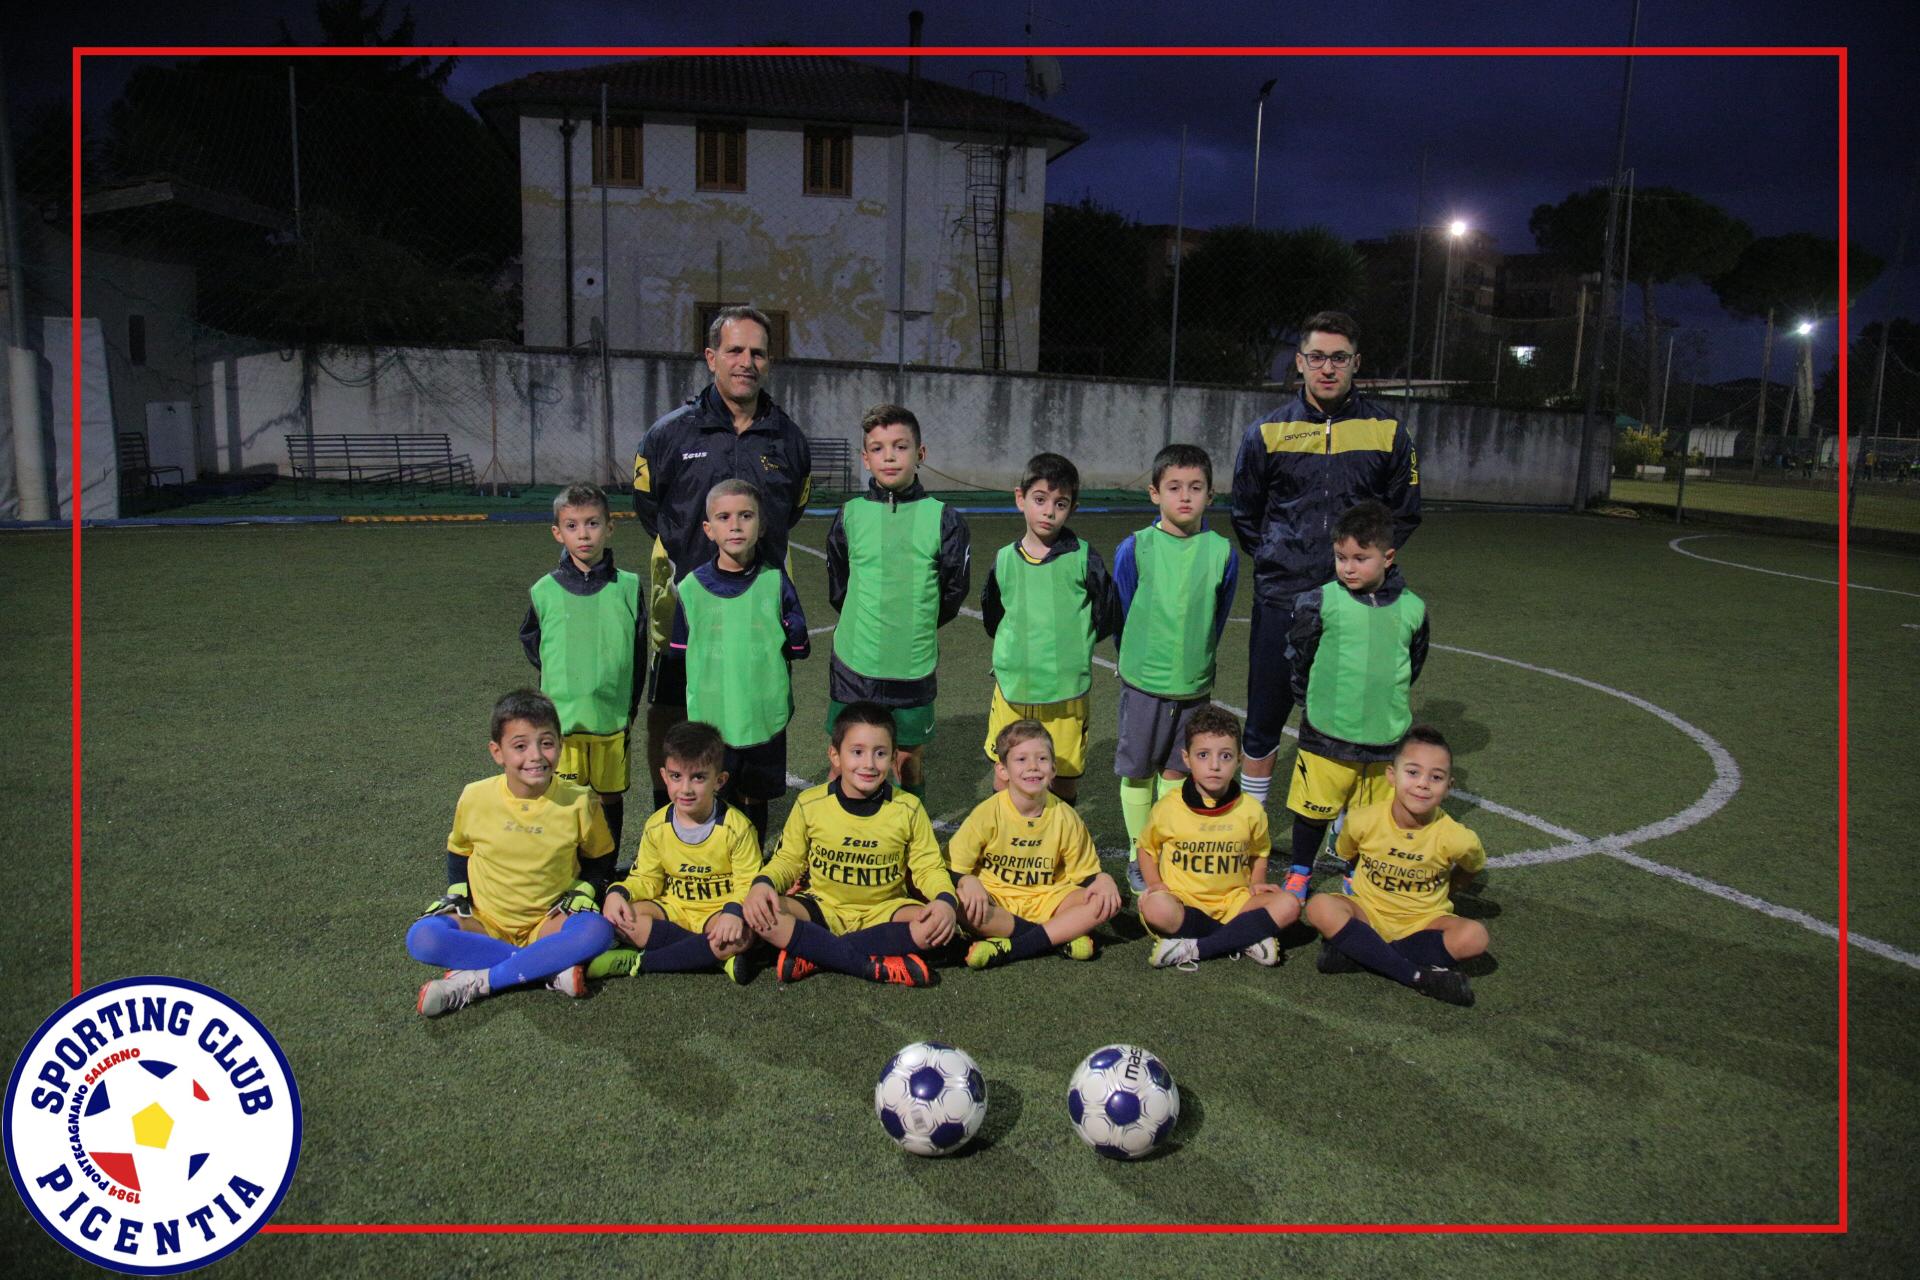 http://www.sportingpicentia.com/wp-content/uploads/2018/11/primicalci.png